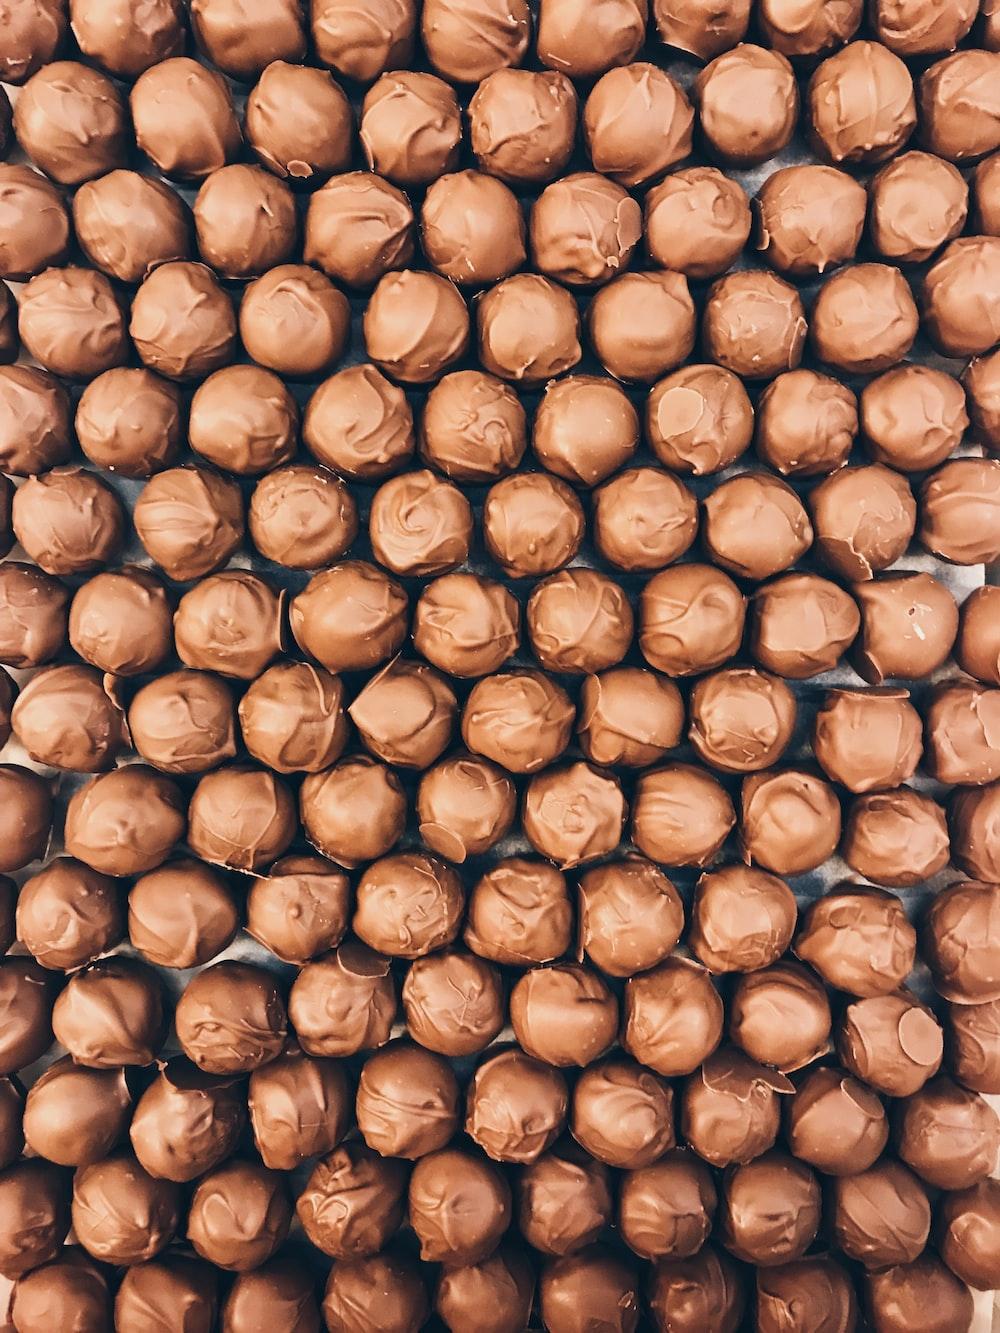 focus photography of chocolates